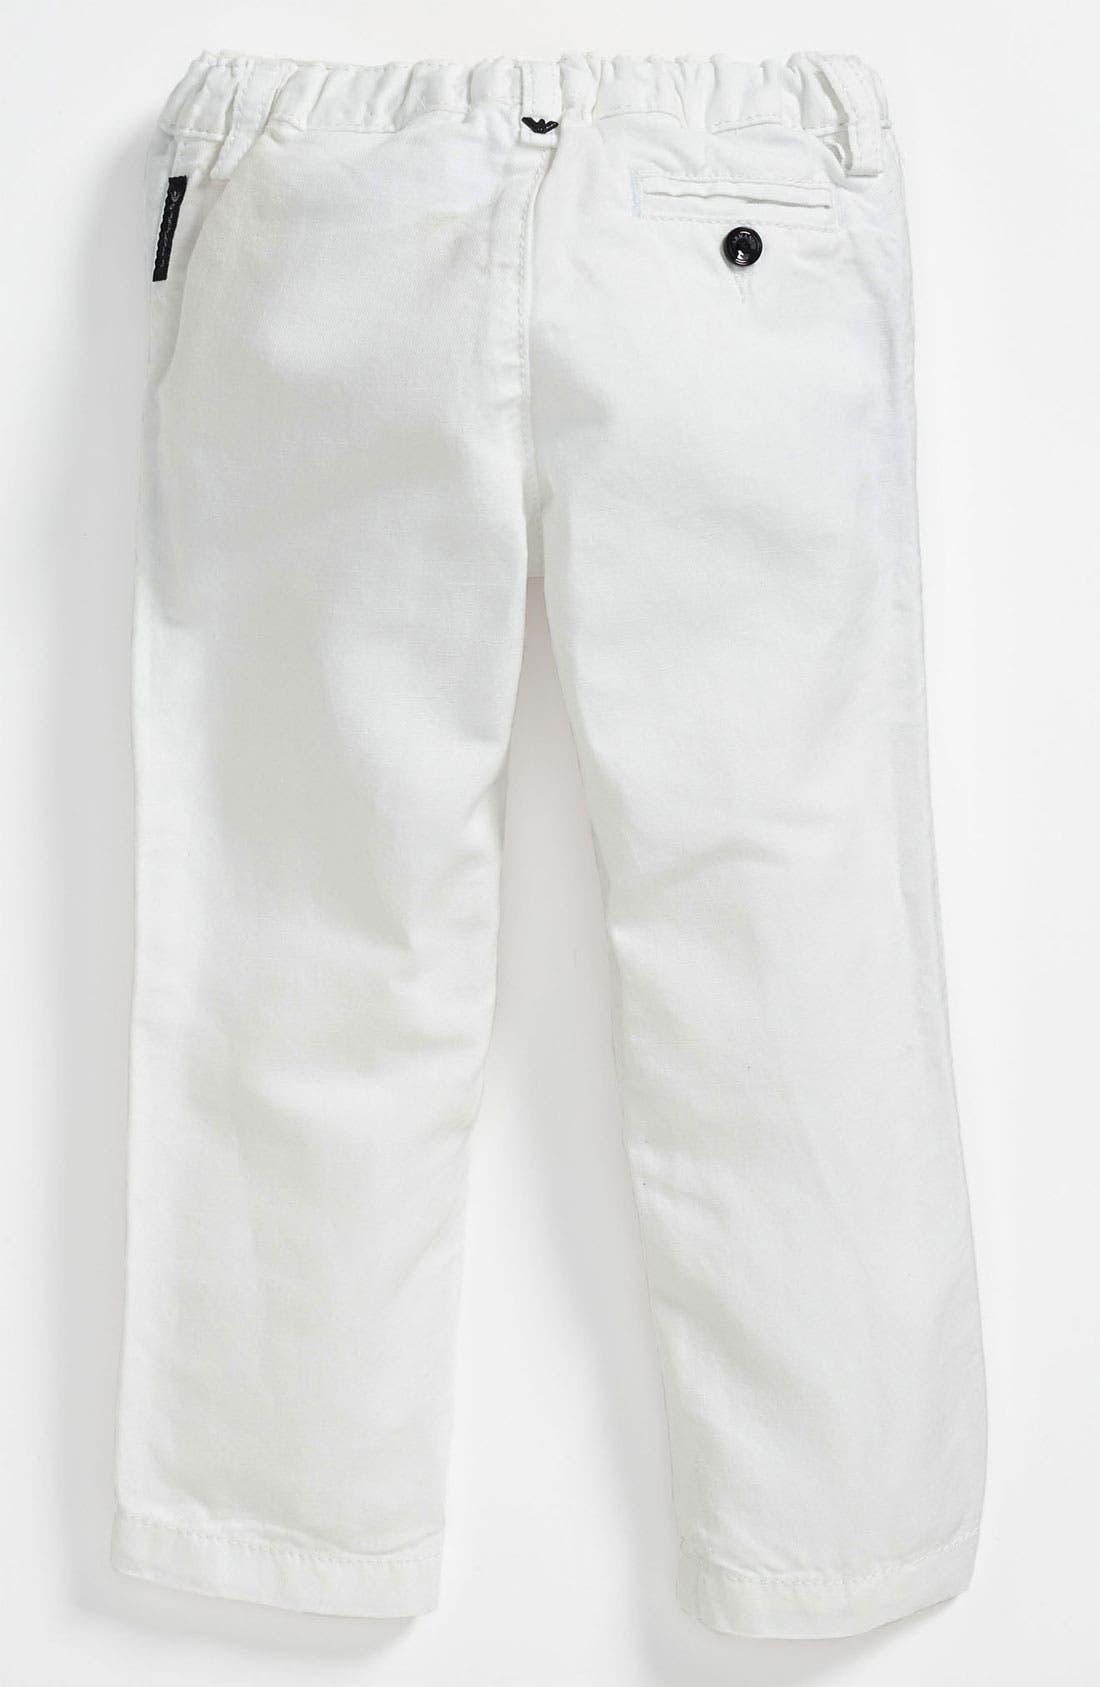 Alternate Image 2  - Armani Junior Pants (Toddler & Little Boys)